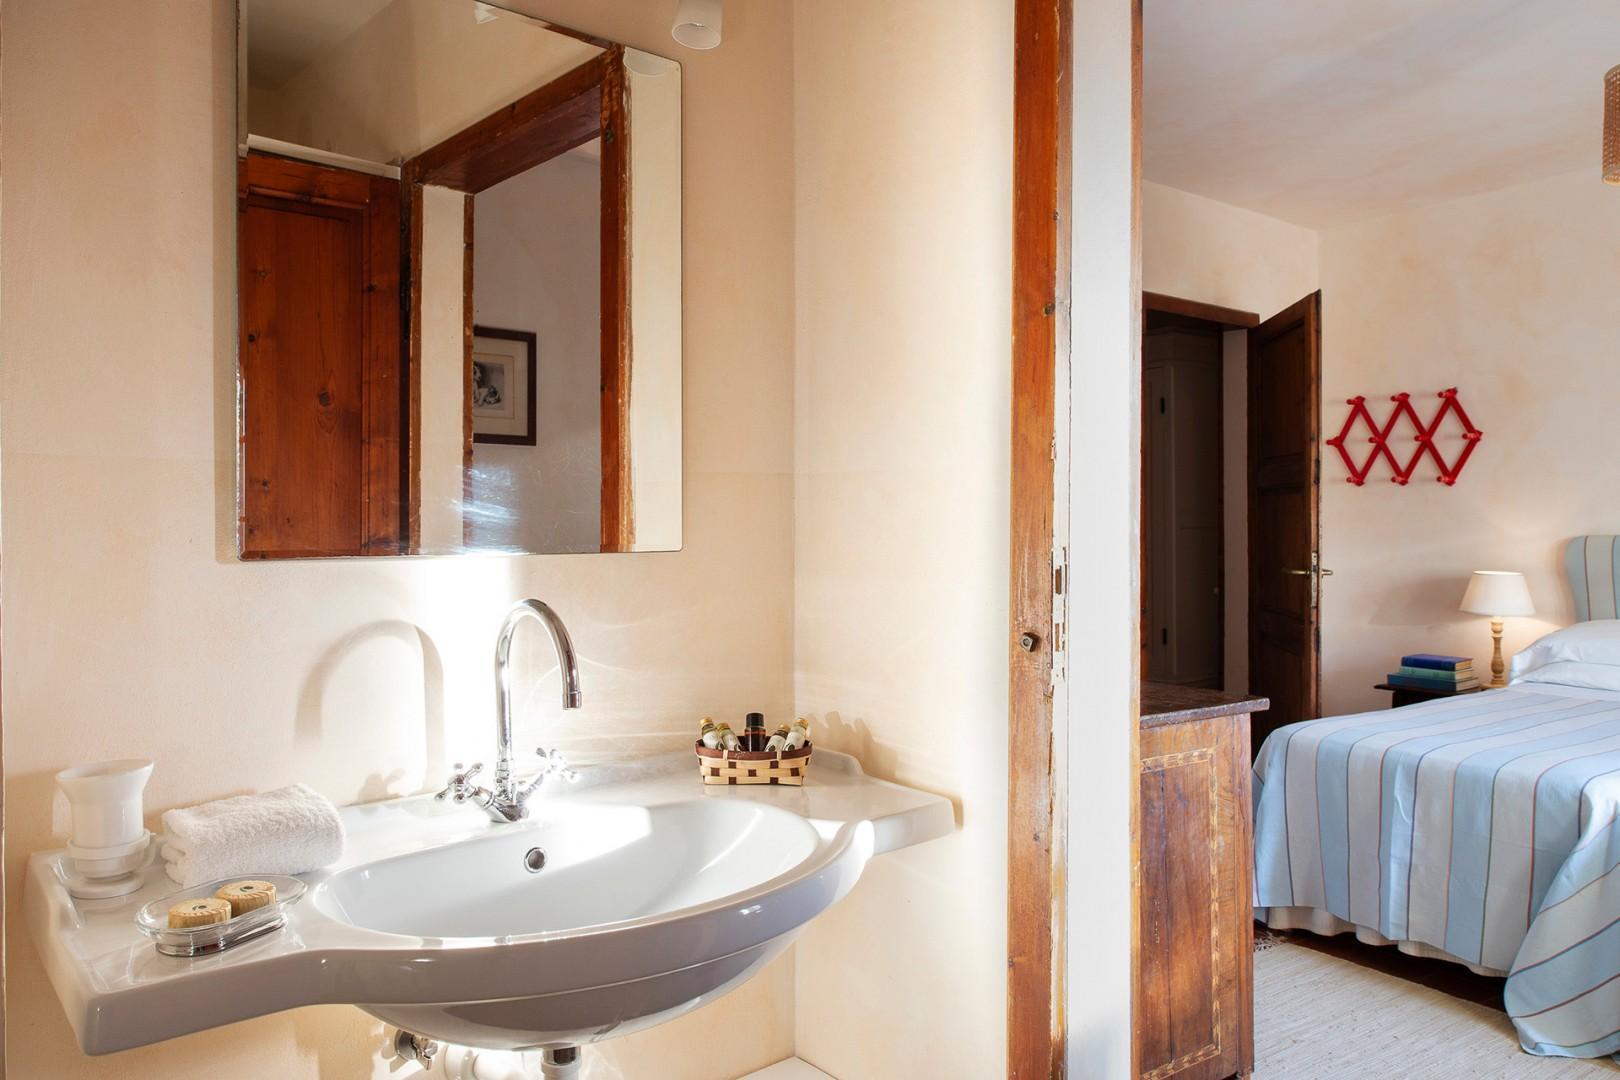 Bathroom en suite to bedroom 2 with shower and sink.